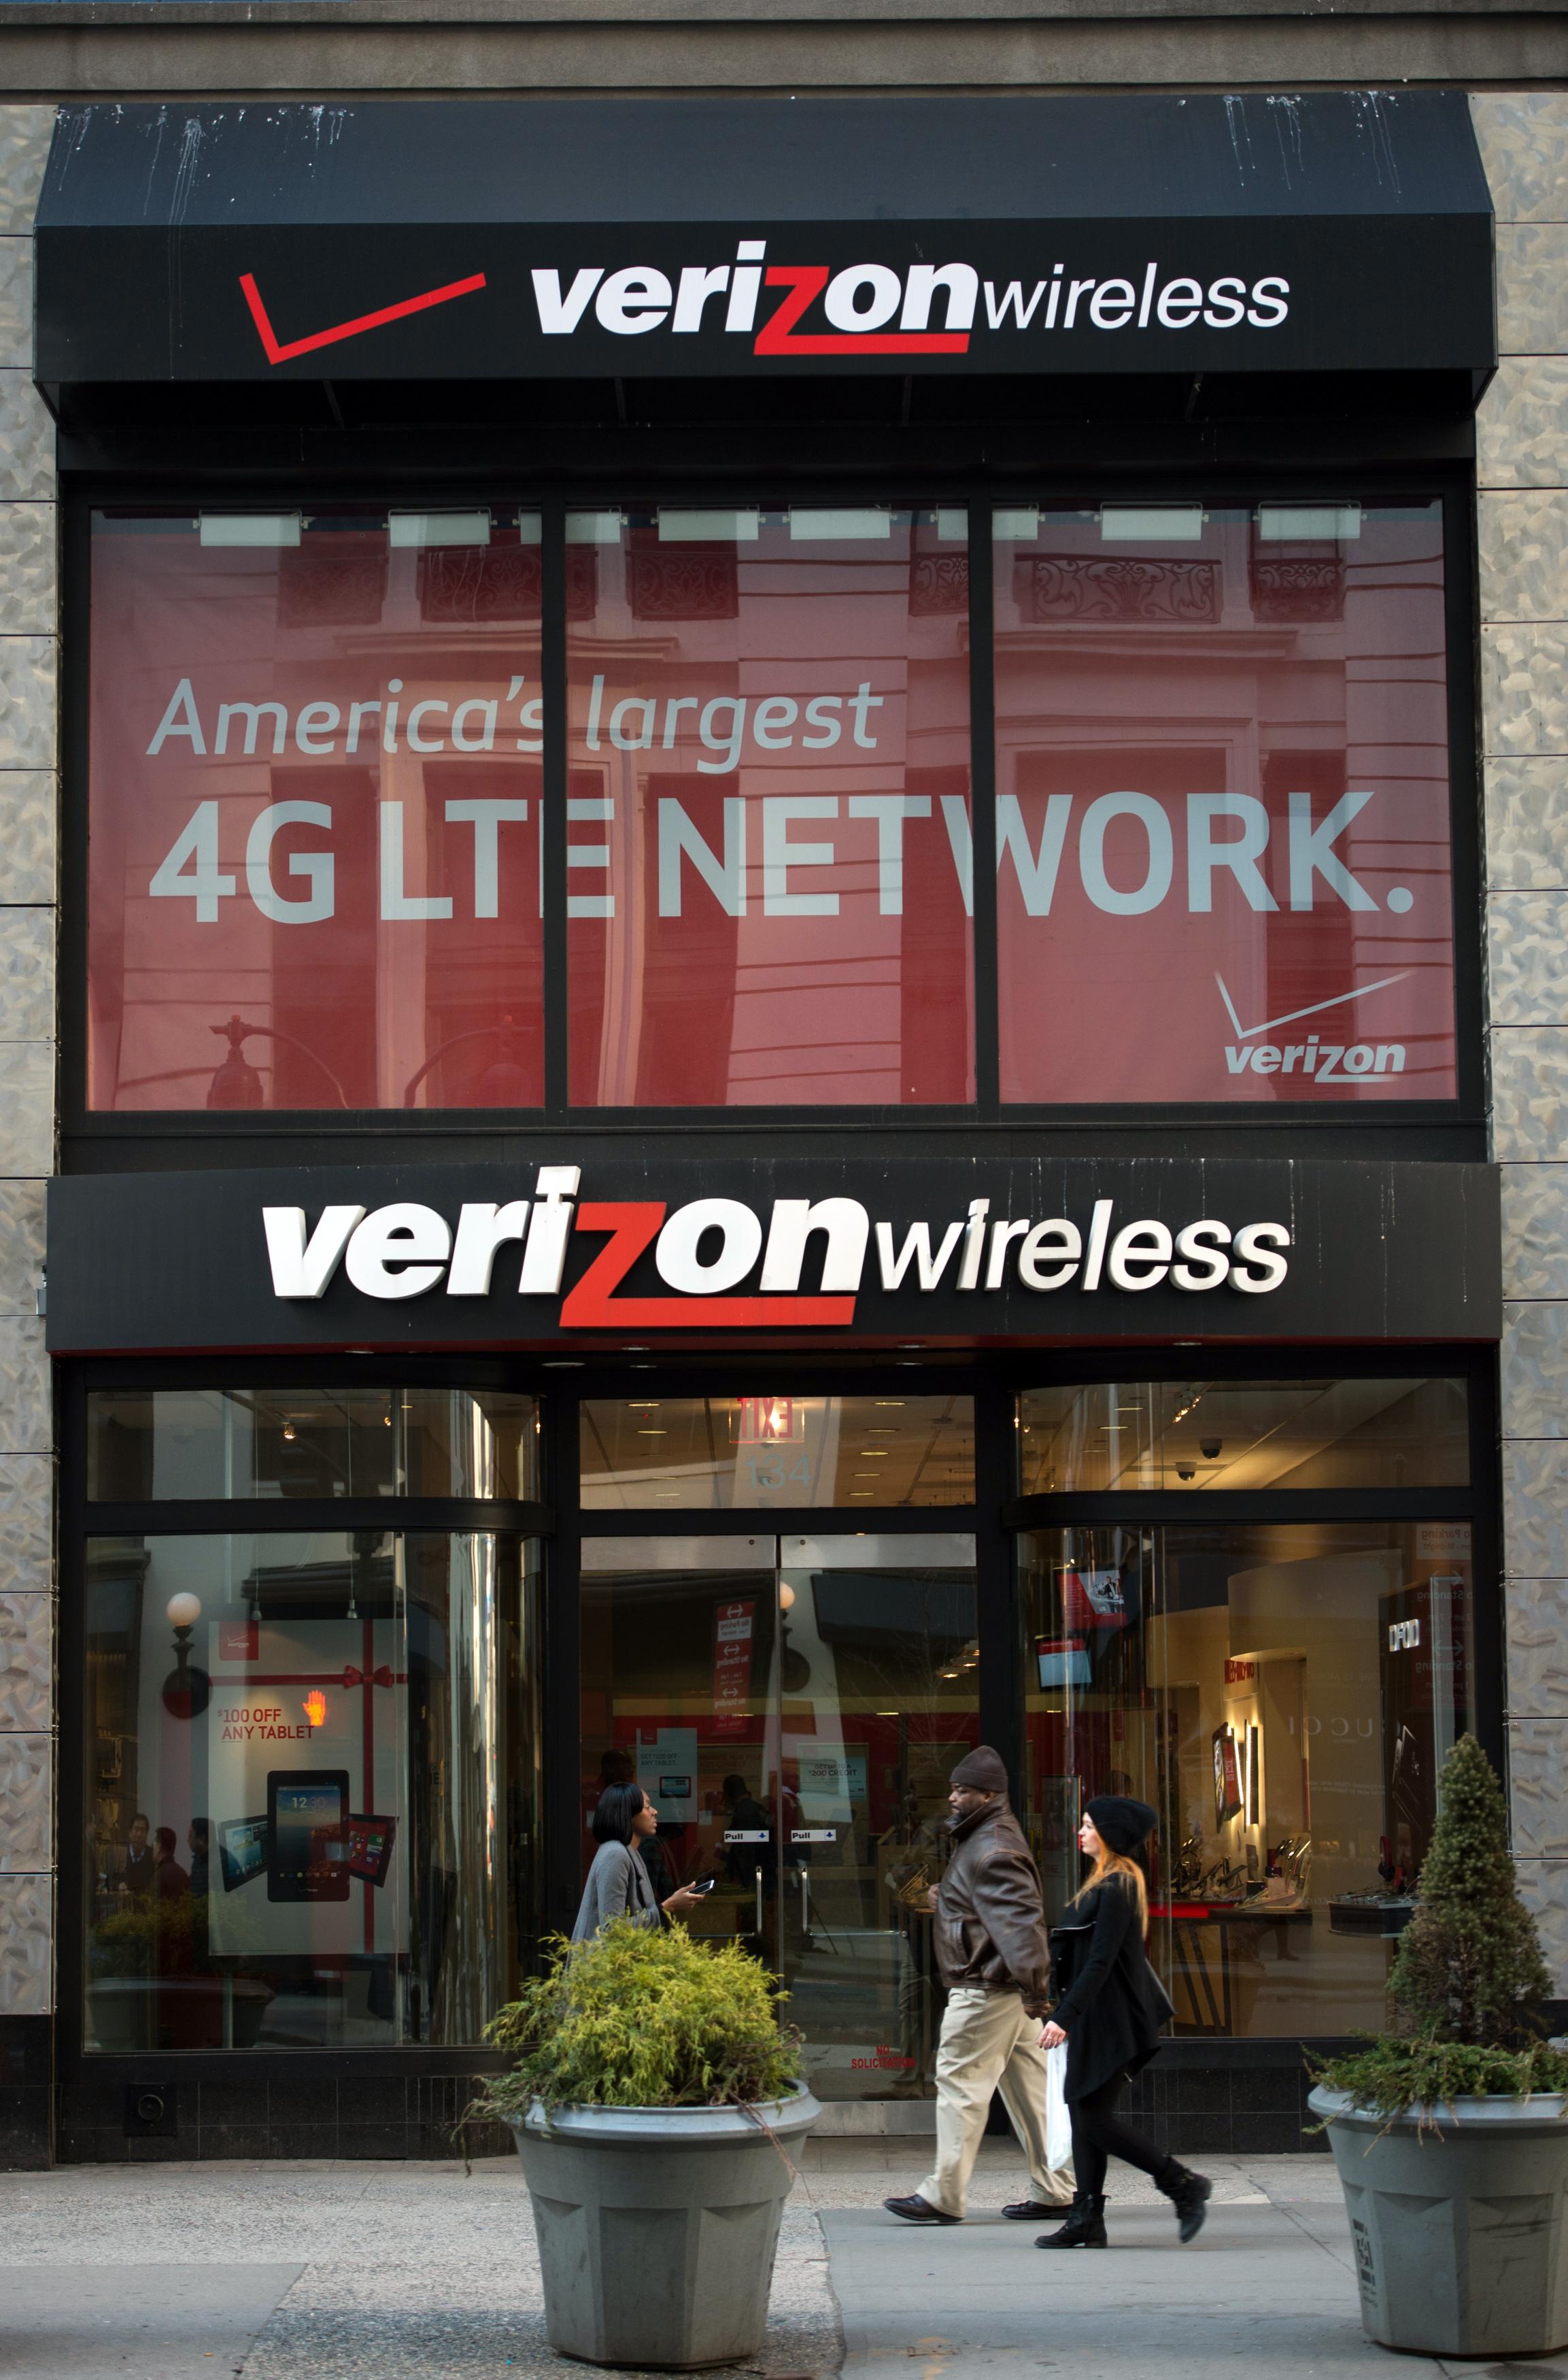 Pedestrians walk past a Verizon Wireless store in New York, U.S., on Friday, Jan. 17, 2014.